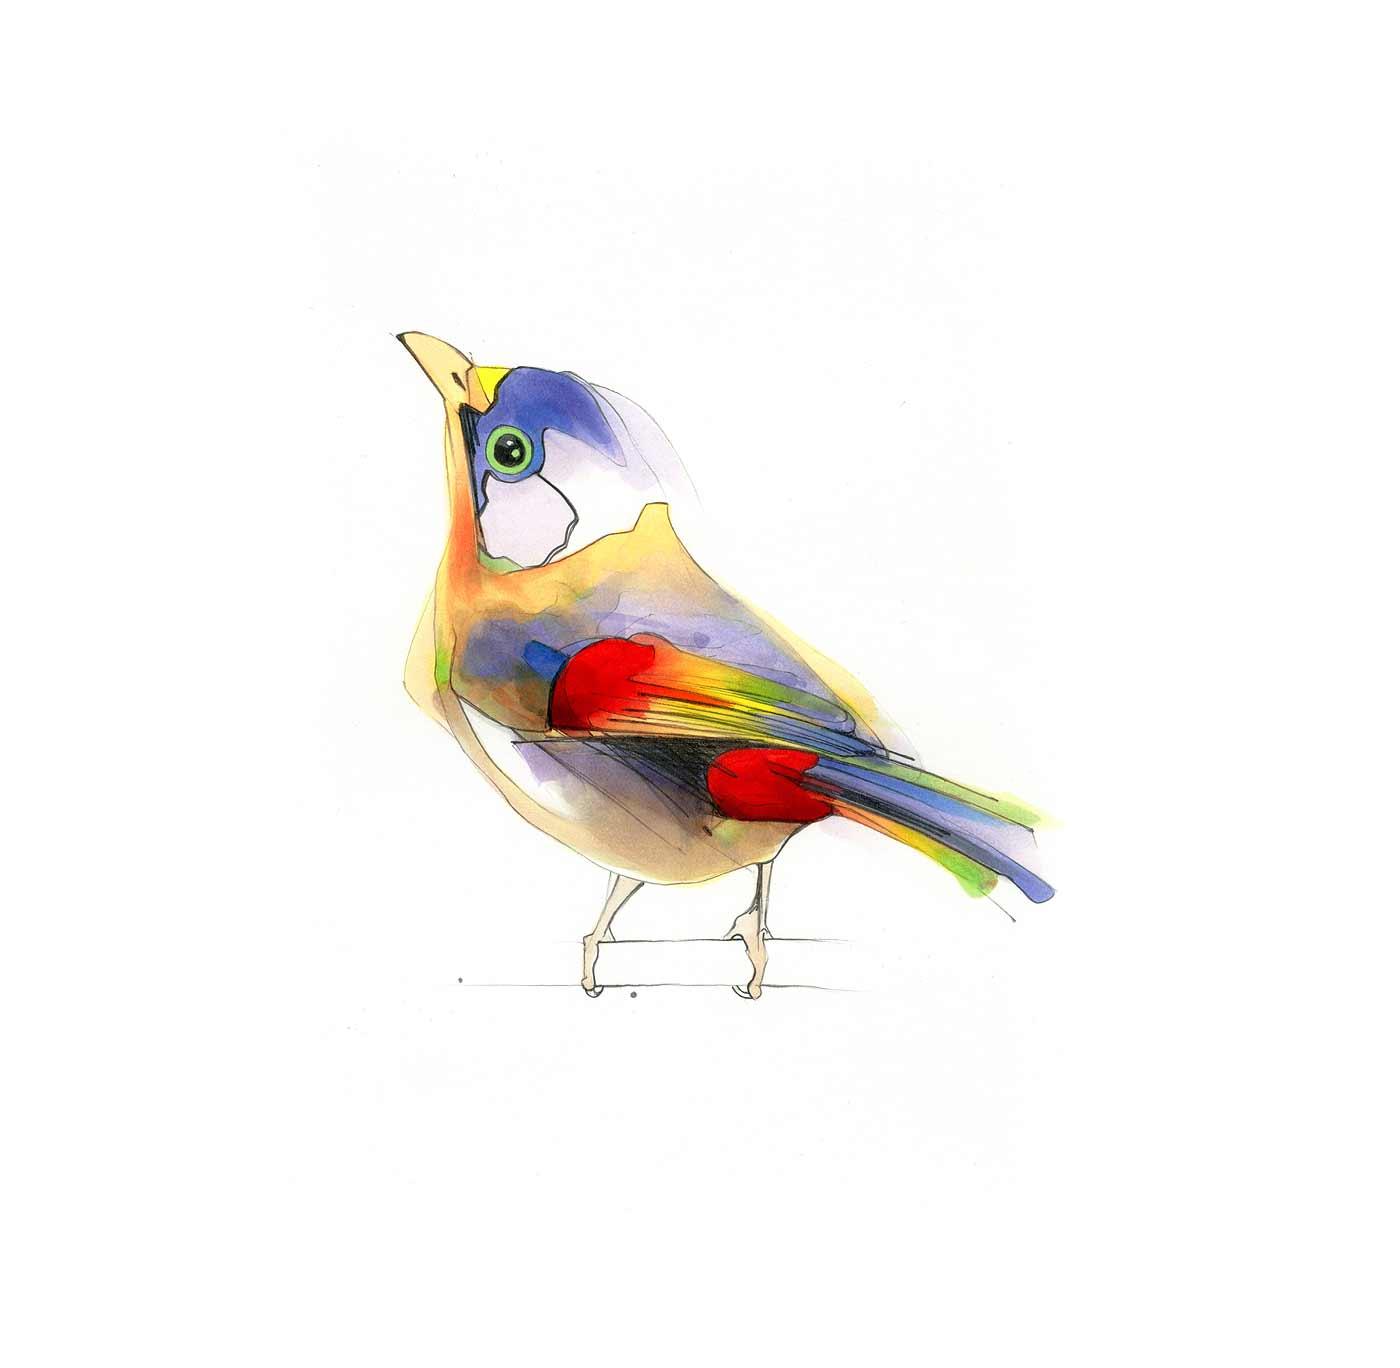 Filzer-Vögel textmarker-voegel_Alexis-Marcou_04